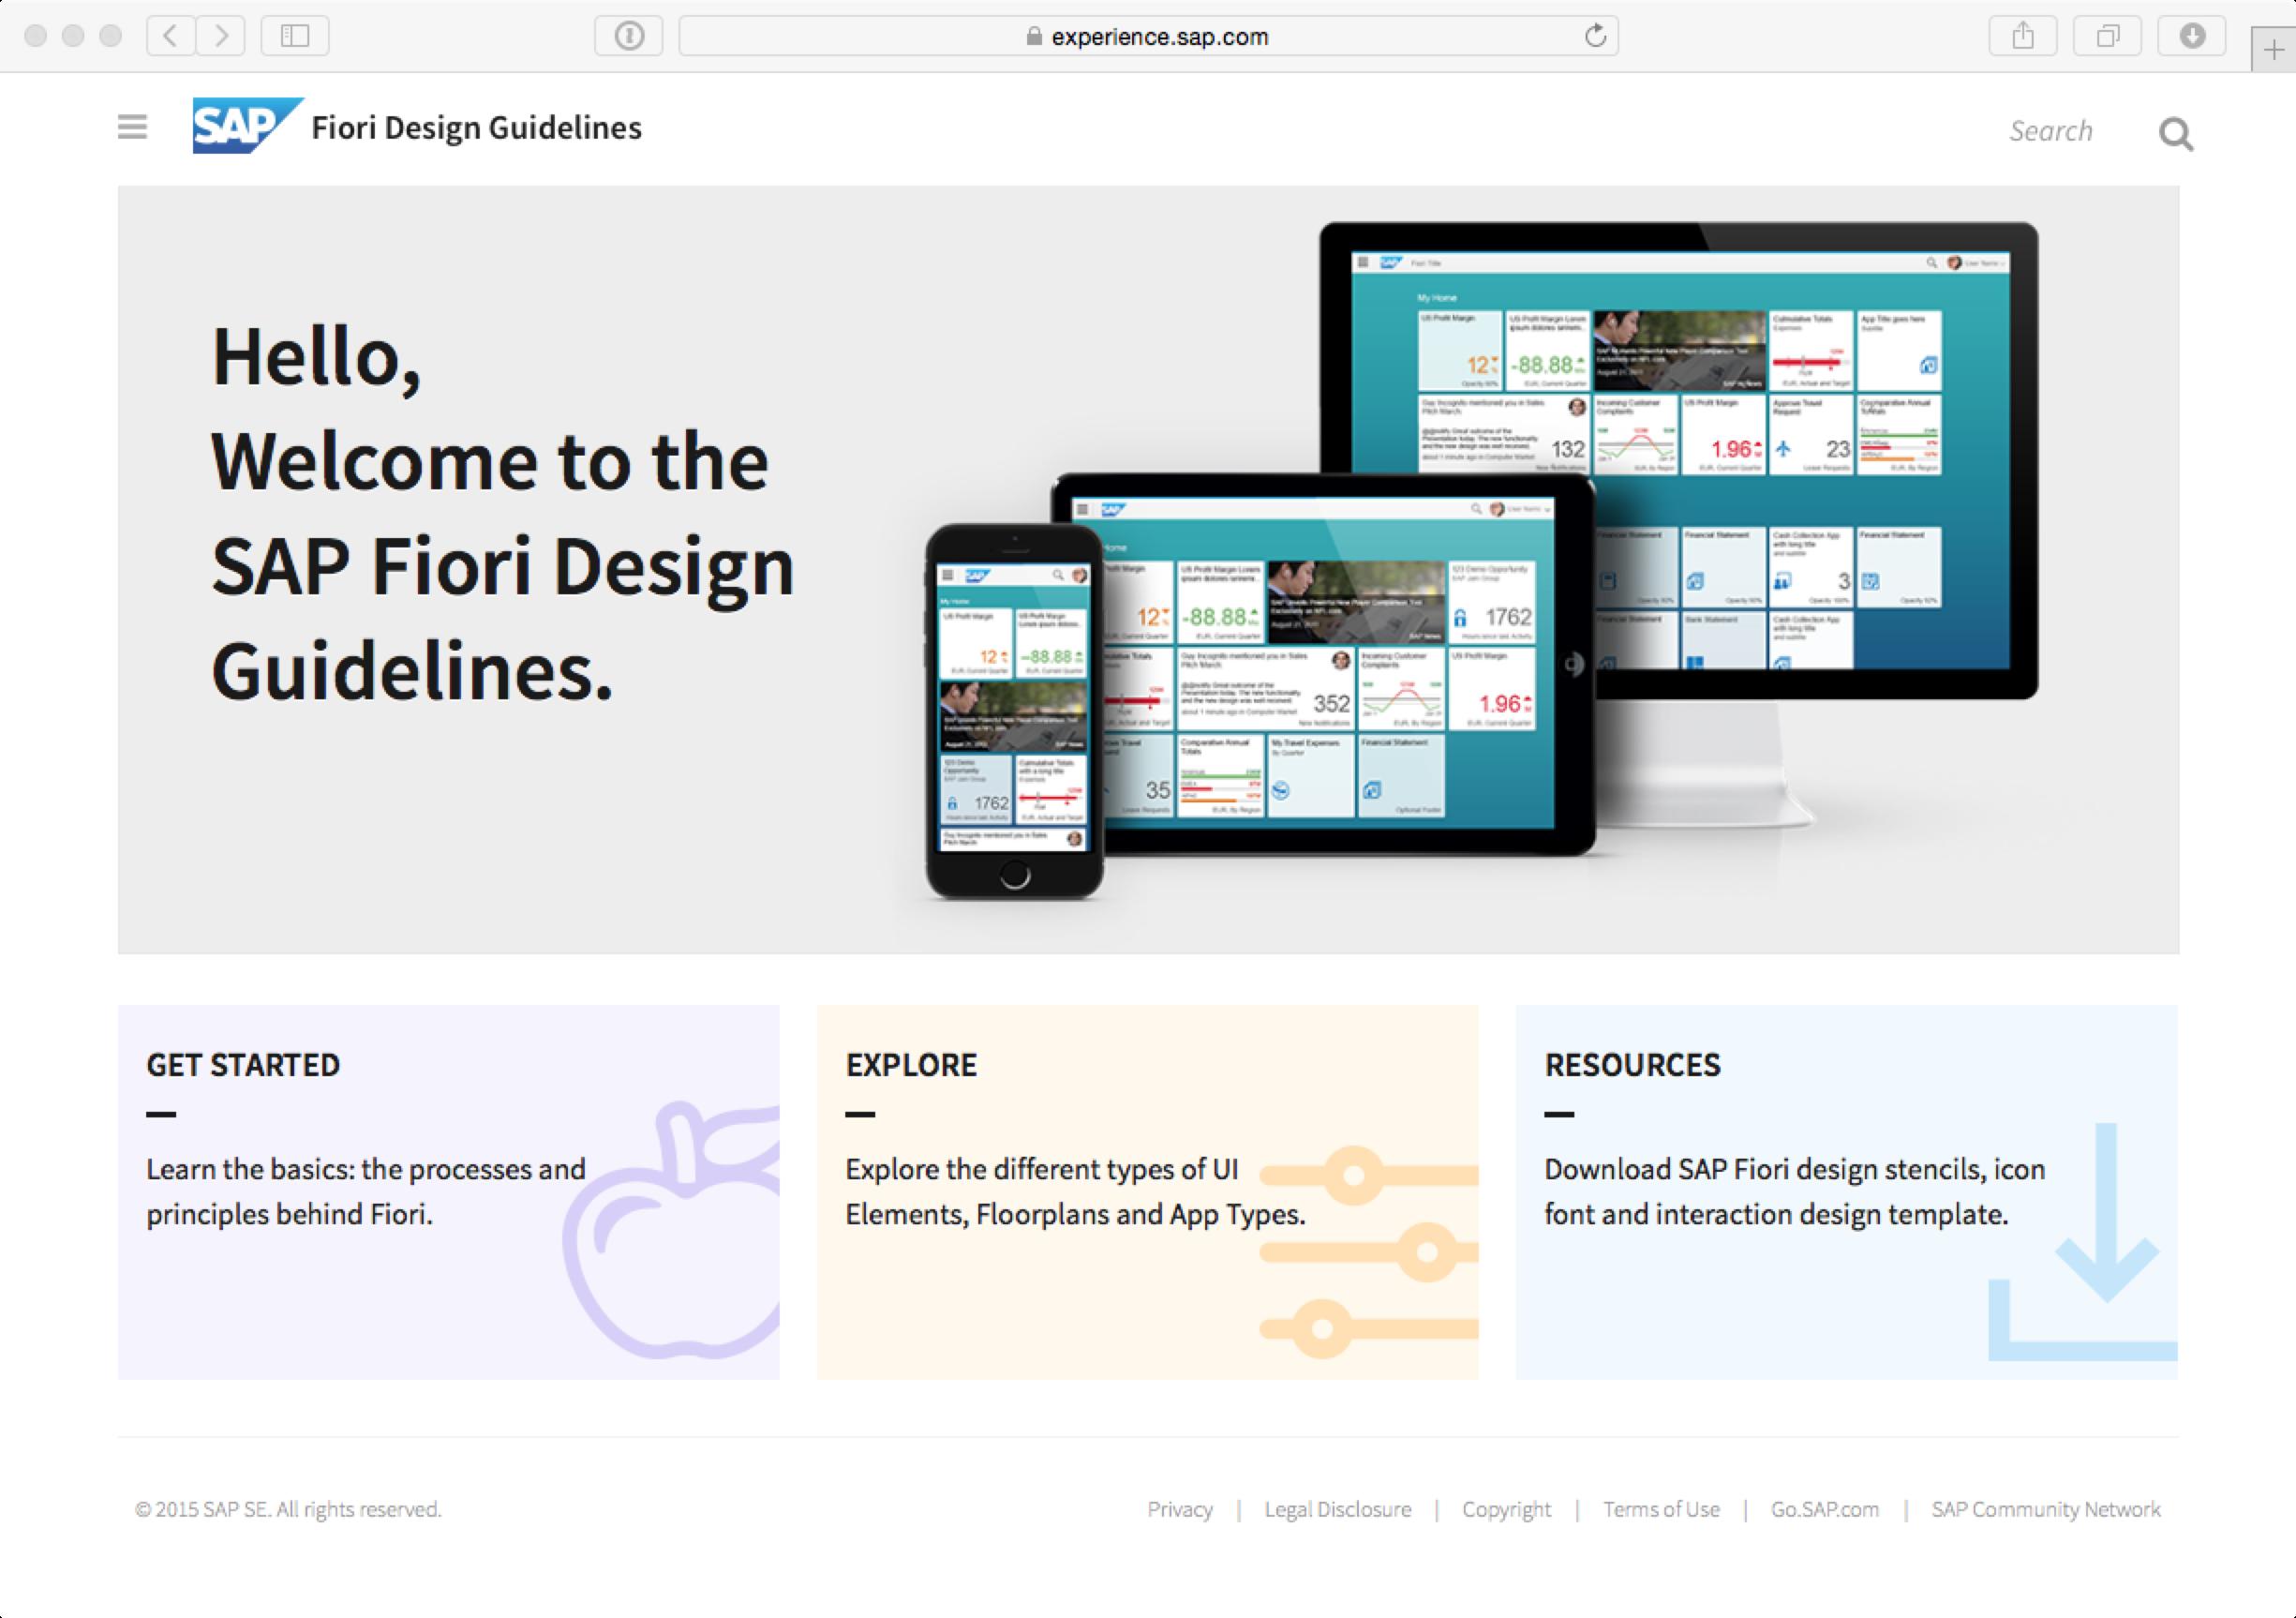 prototyping sap fiori applications | sap blogs, Presentation templates